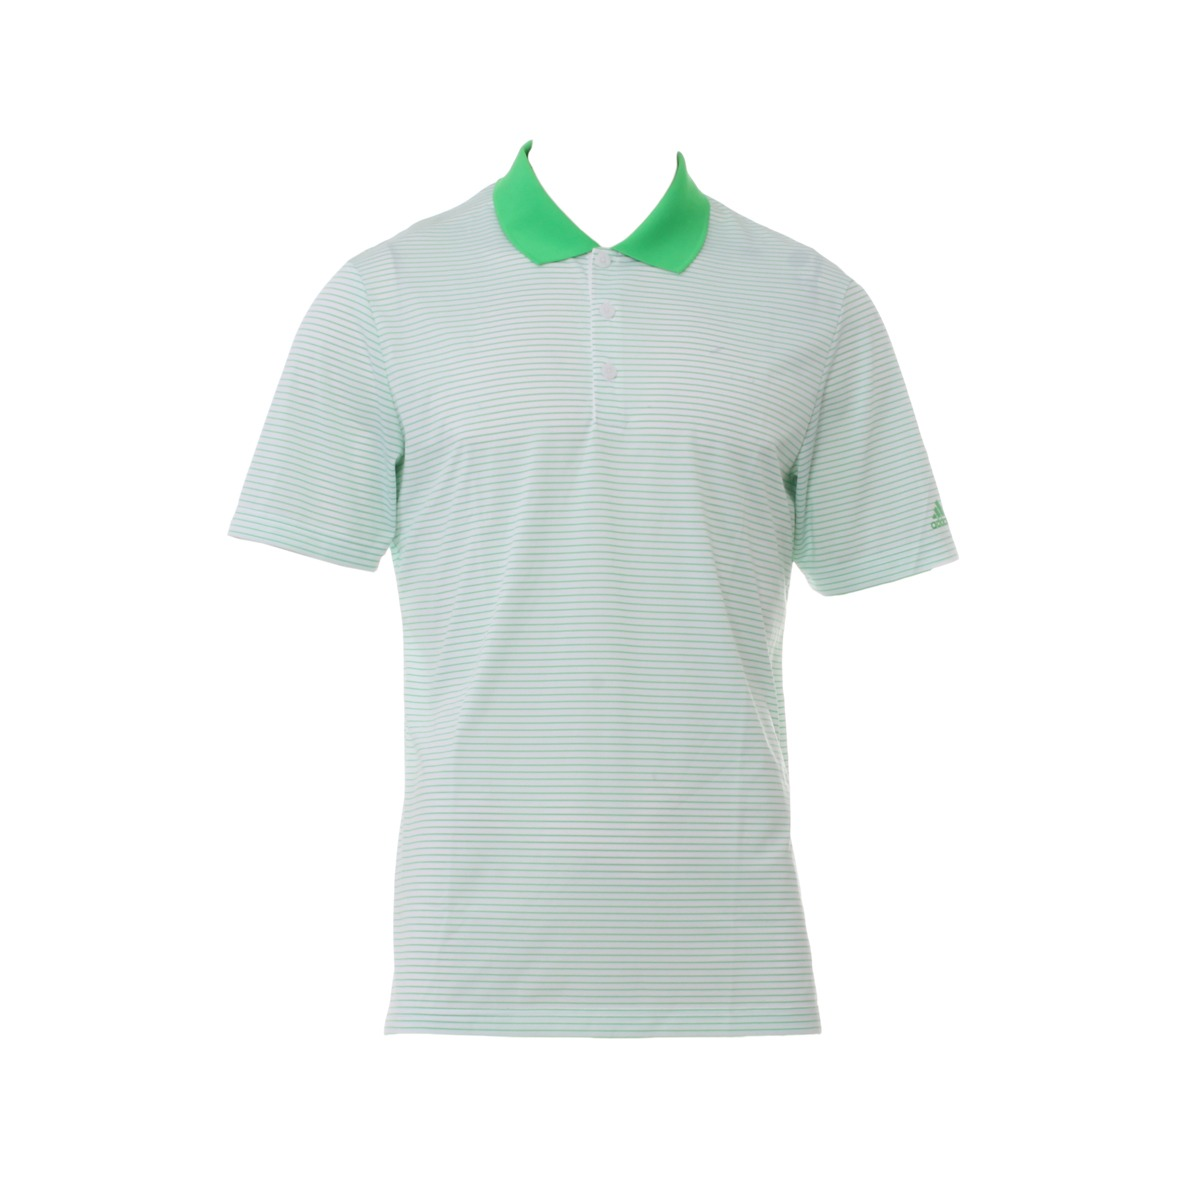 Chomba adidas Golf Merch Hombre Mf mz -   900 90596057e8207